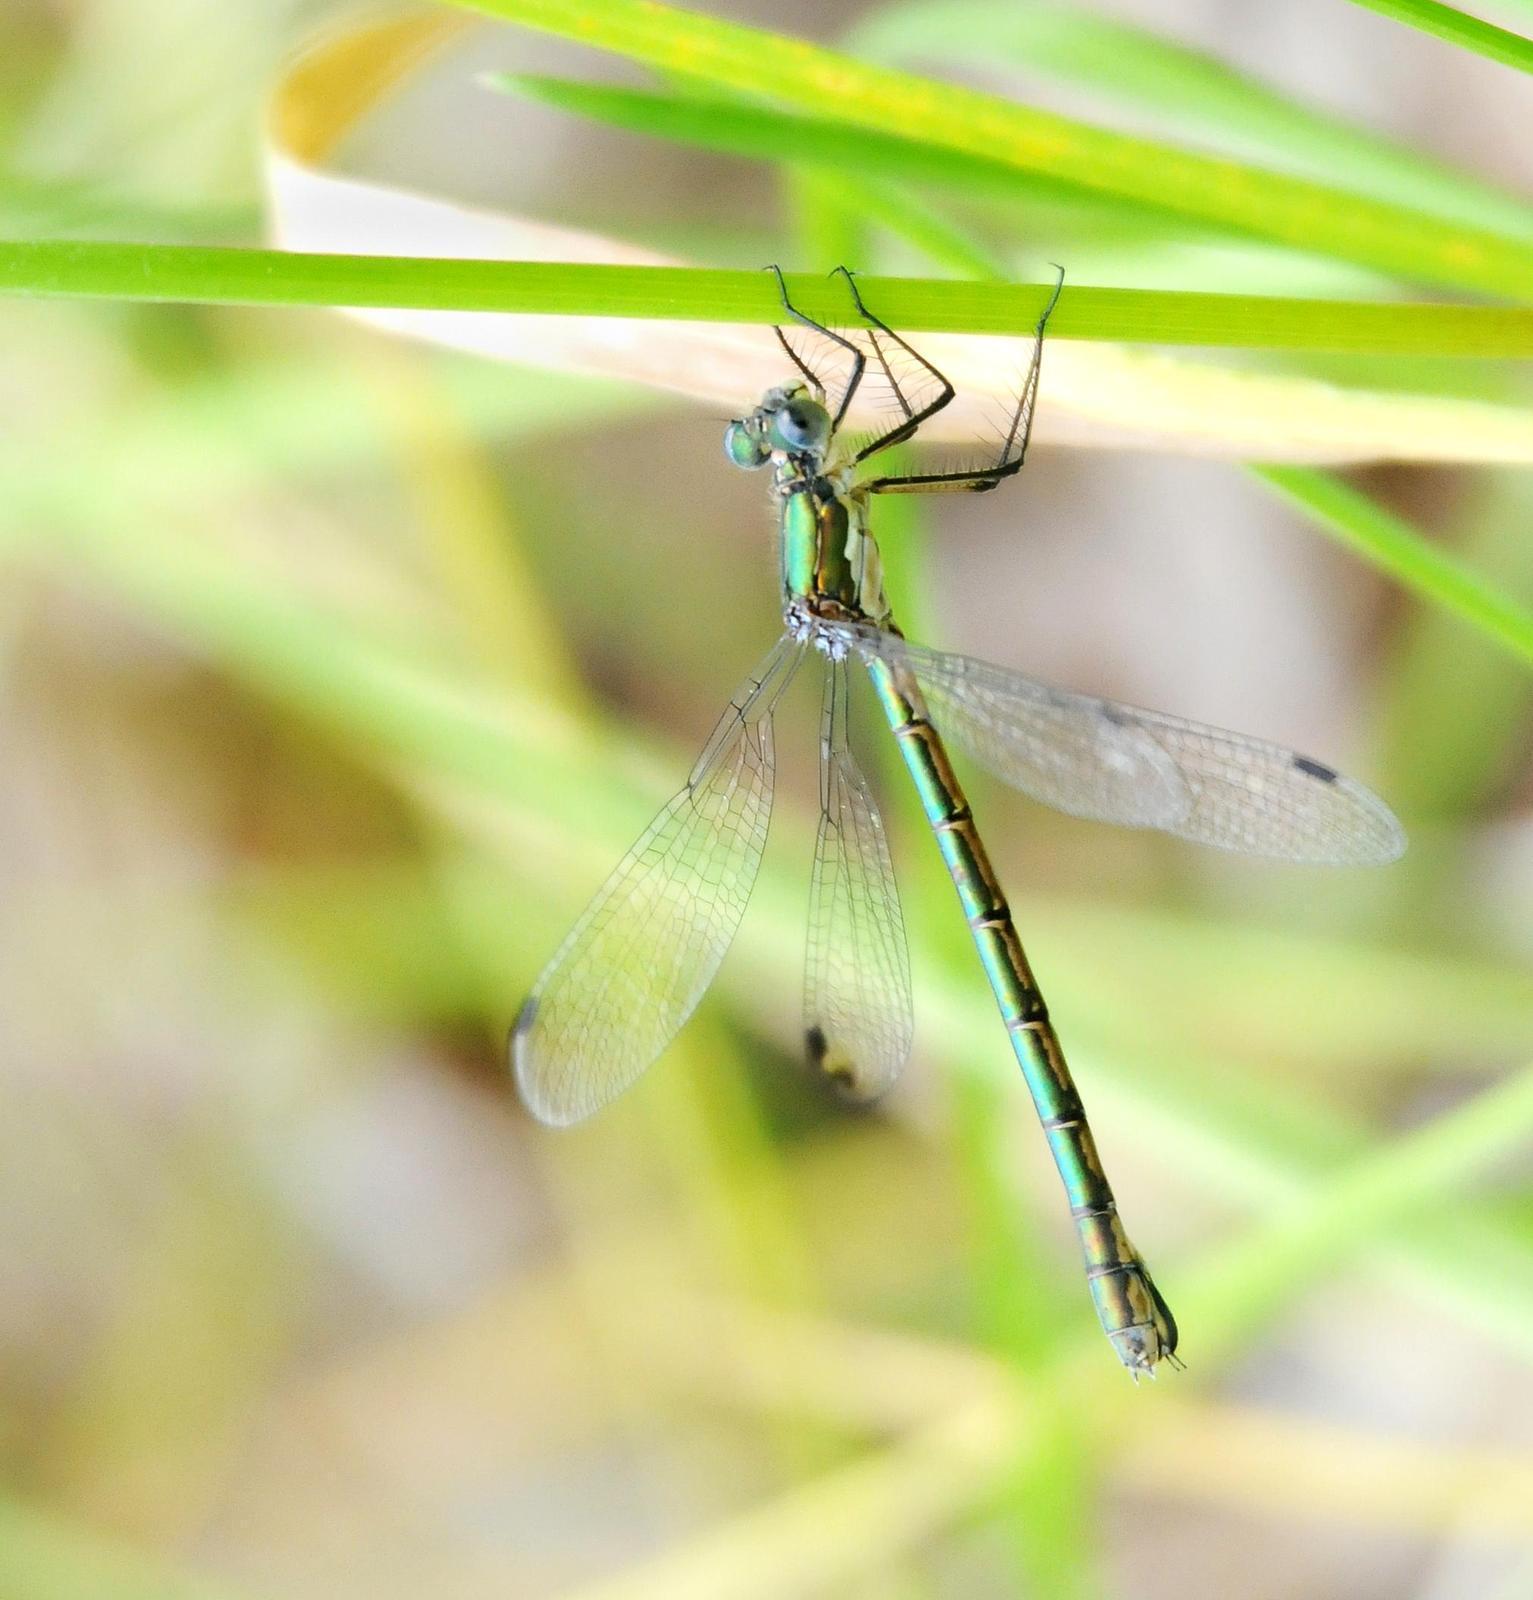 Emerald Spreadwing Photo by Steven Mlodinow